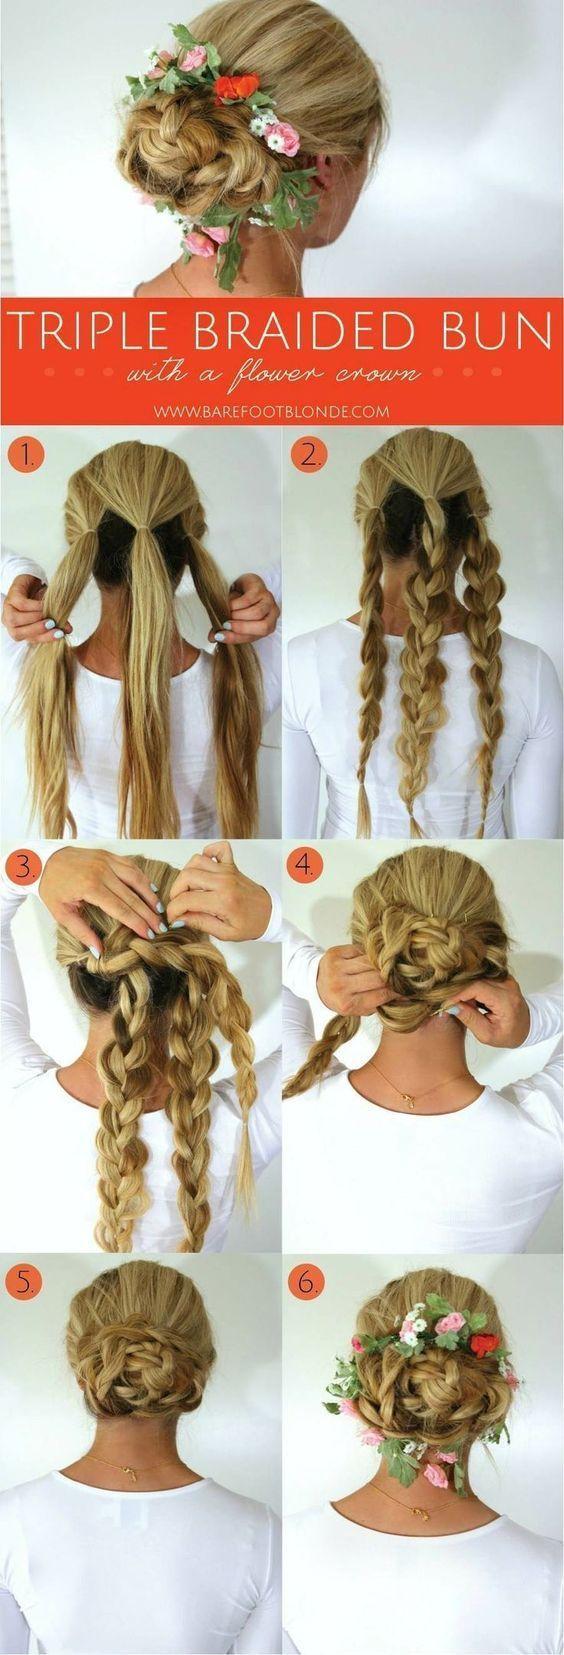 Awe Inspiring 1000 Ideas About Easy Work Hairstyles On Pinterest Work Short Hairstyles For Black Women Fulllsitofus